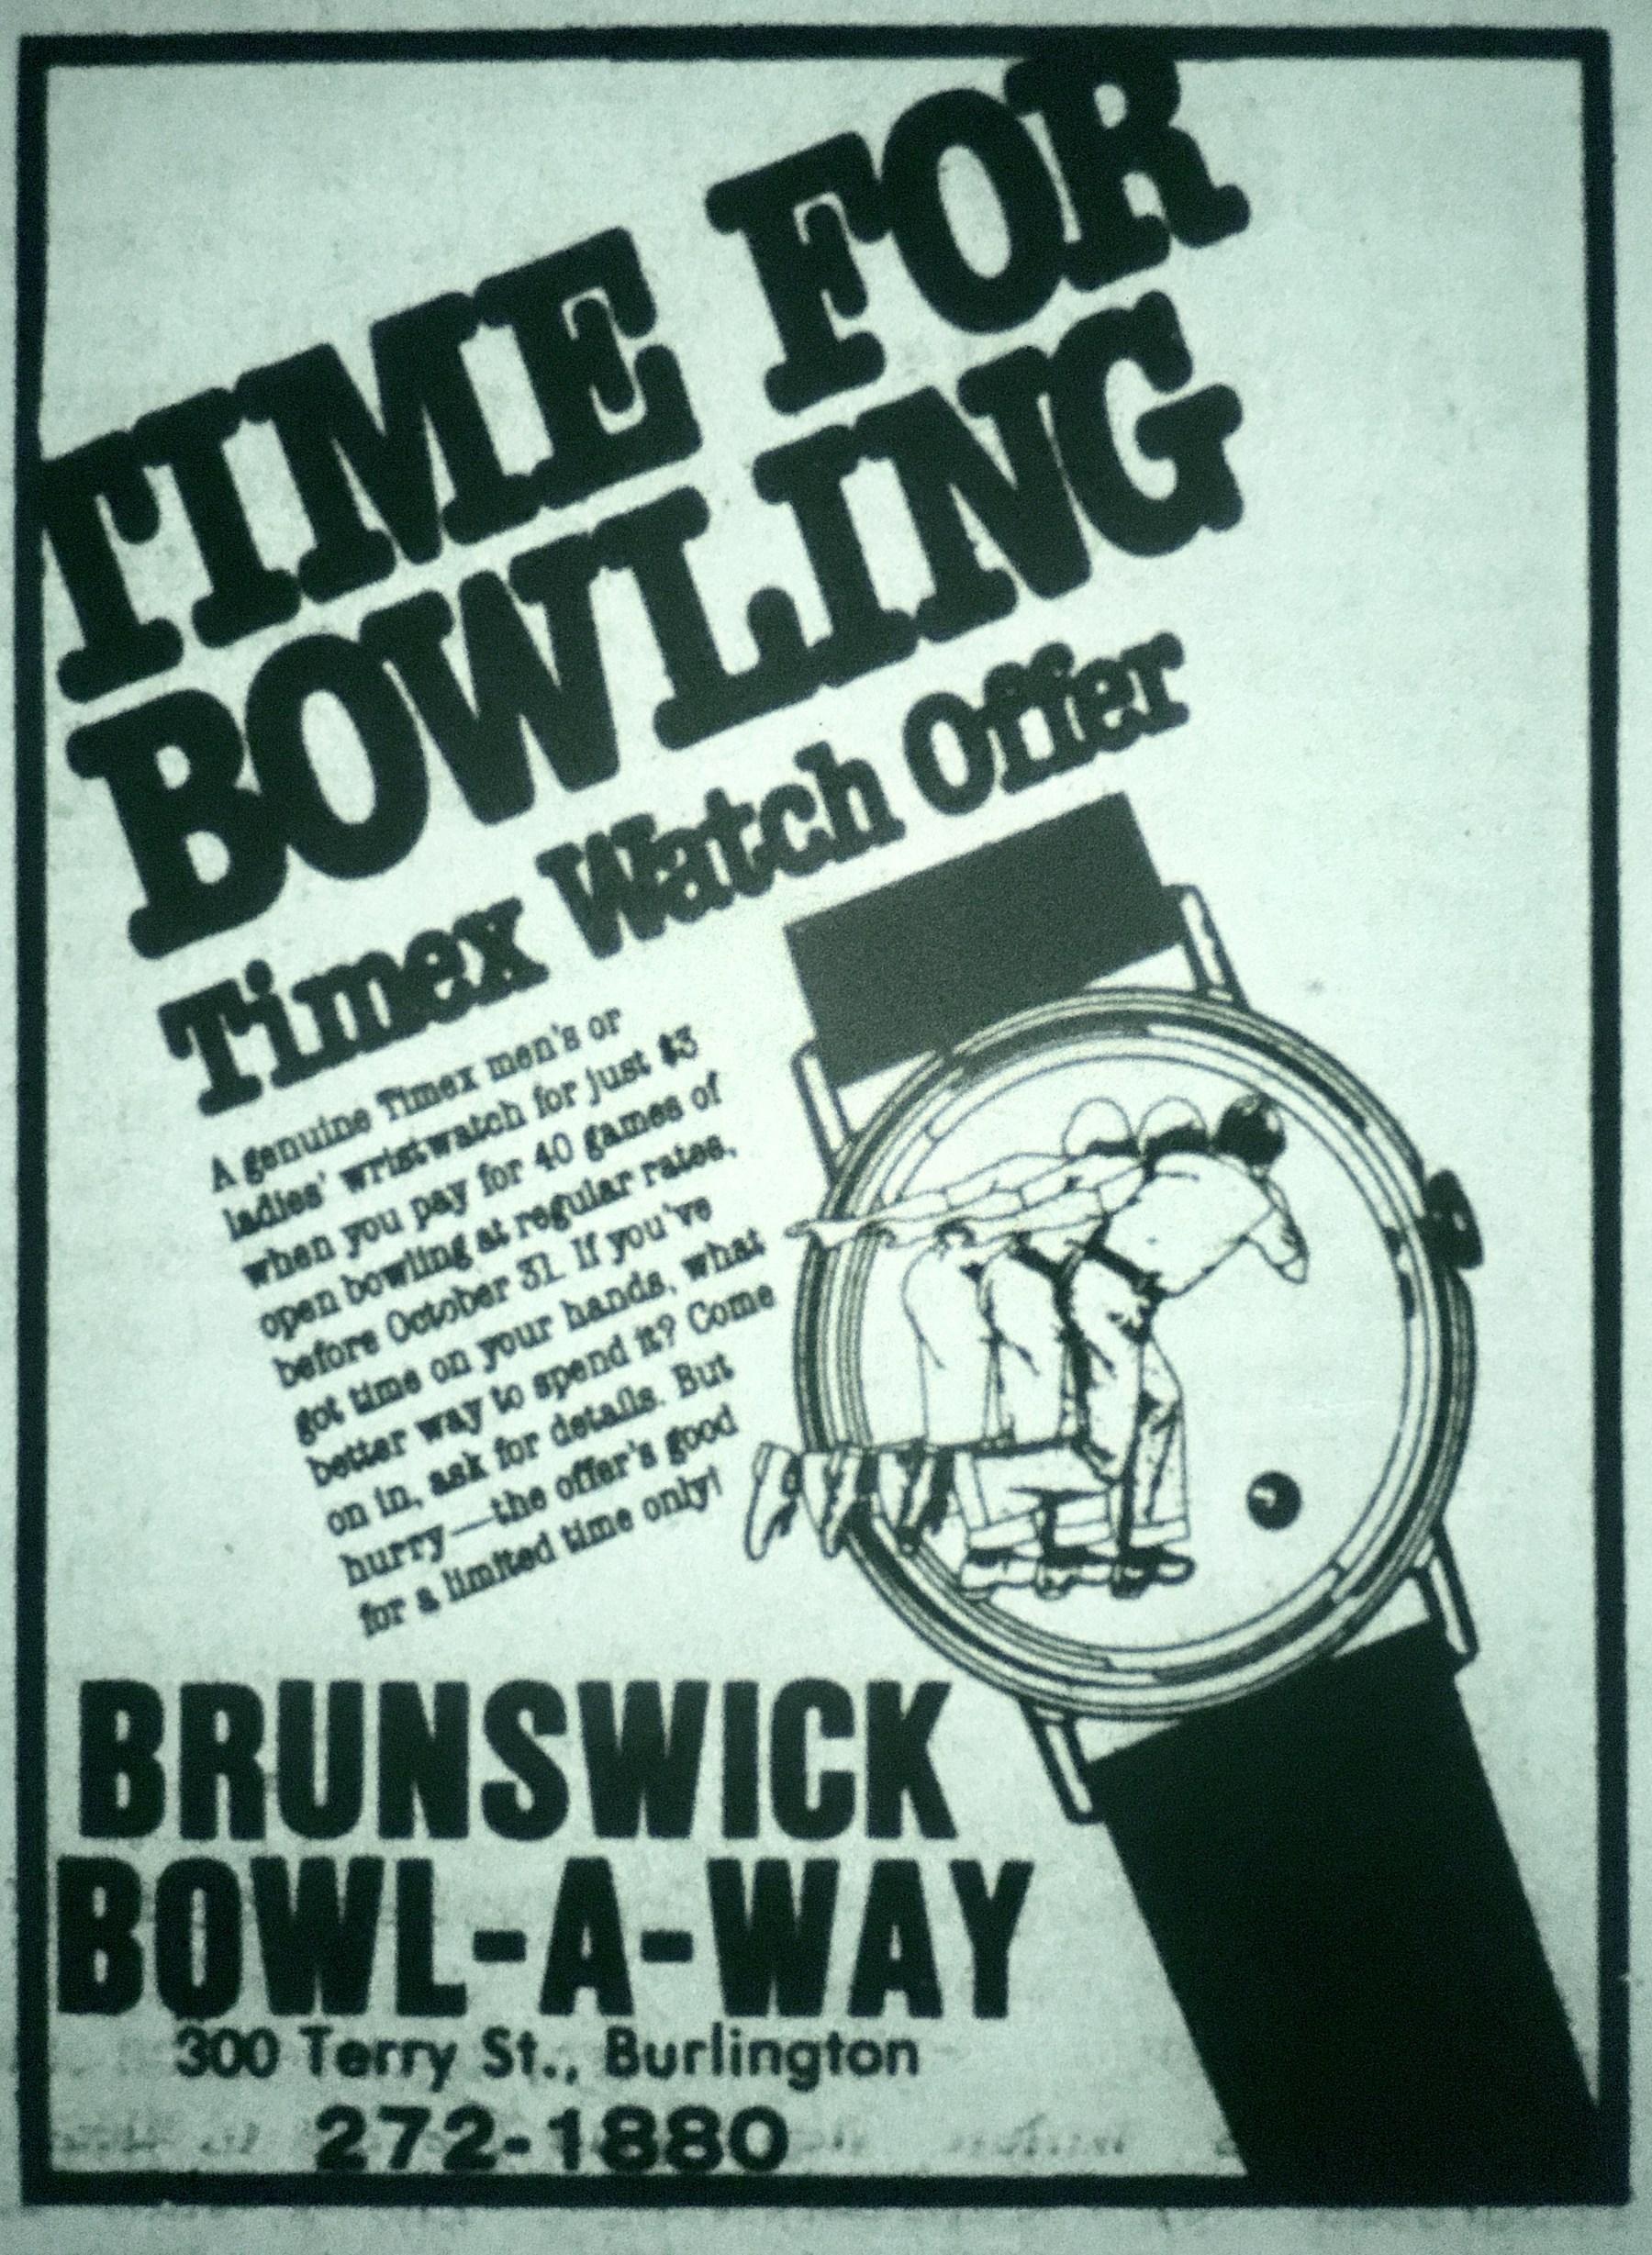 Brunswick Bowl-A-Way lanes, Burlington MA